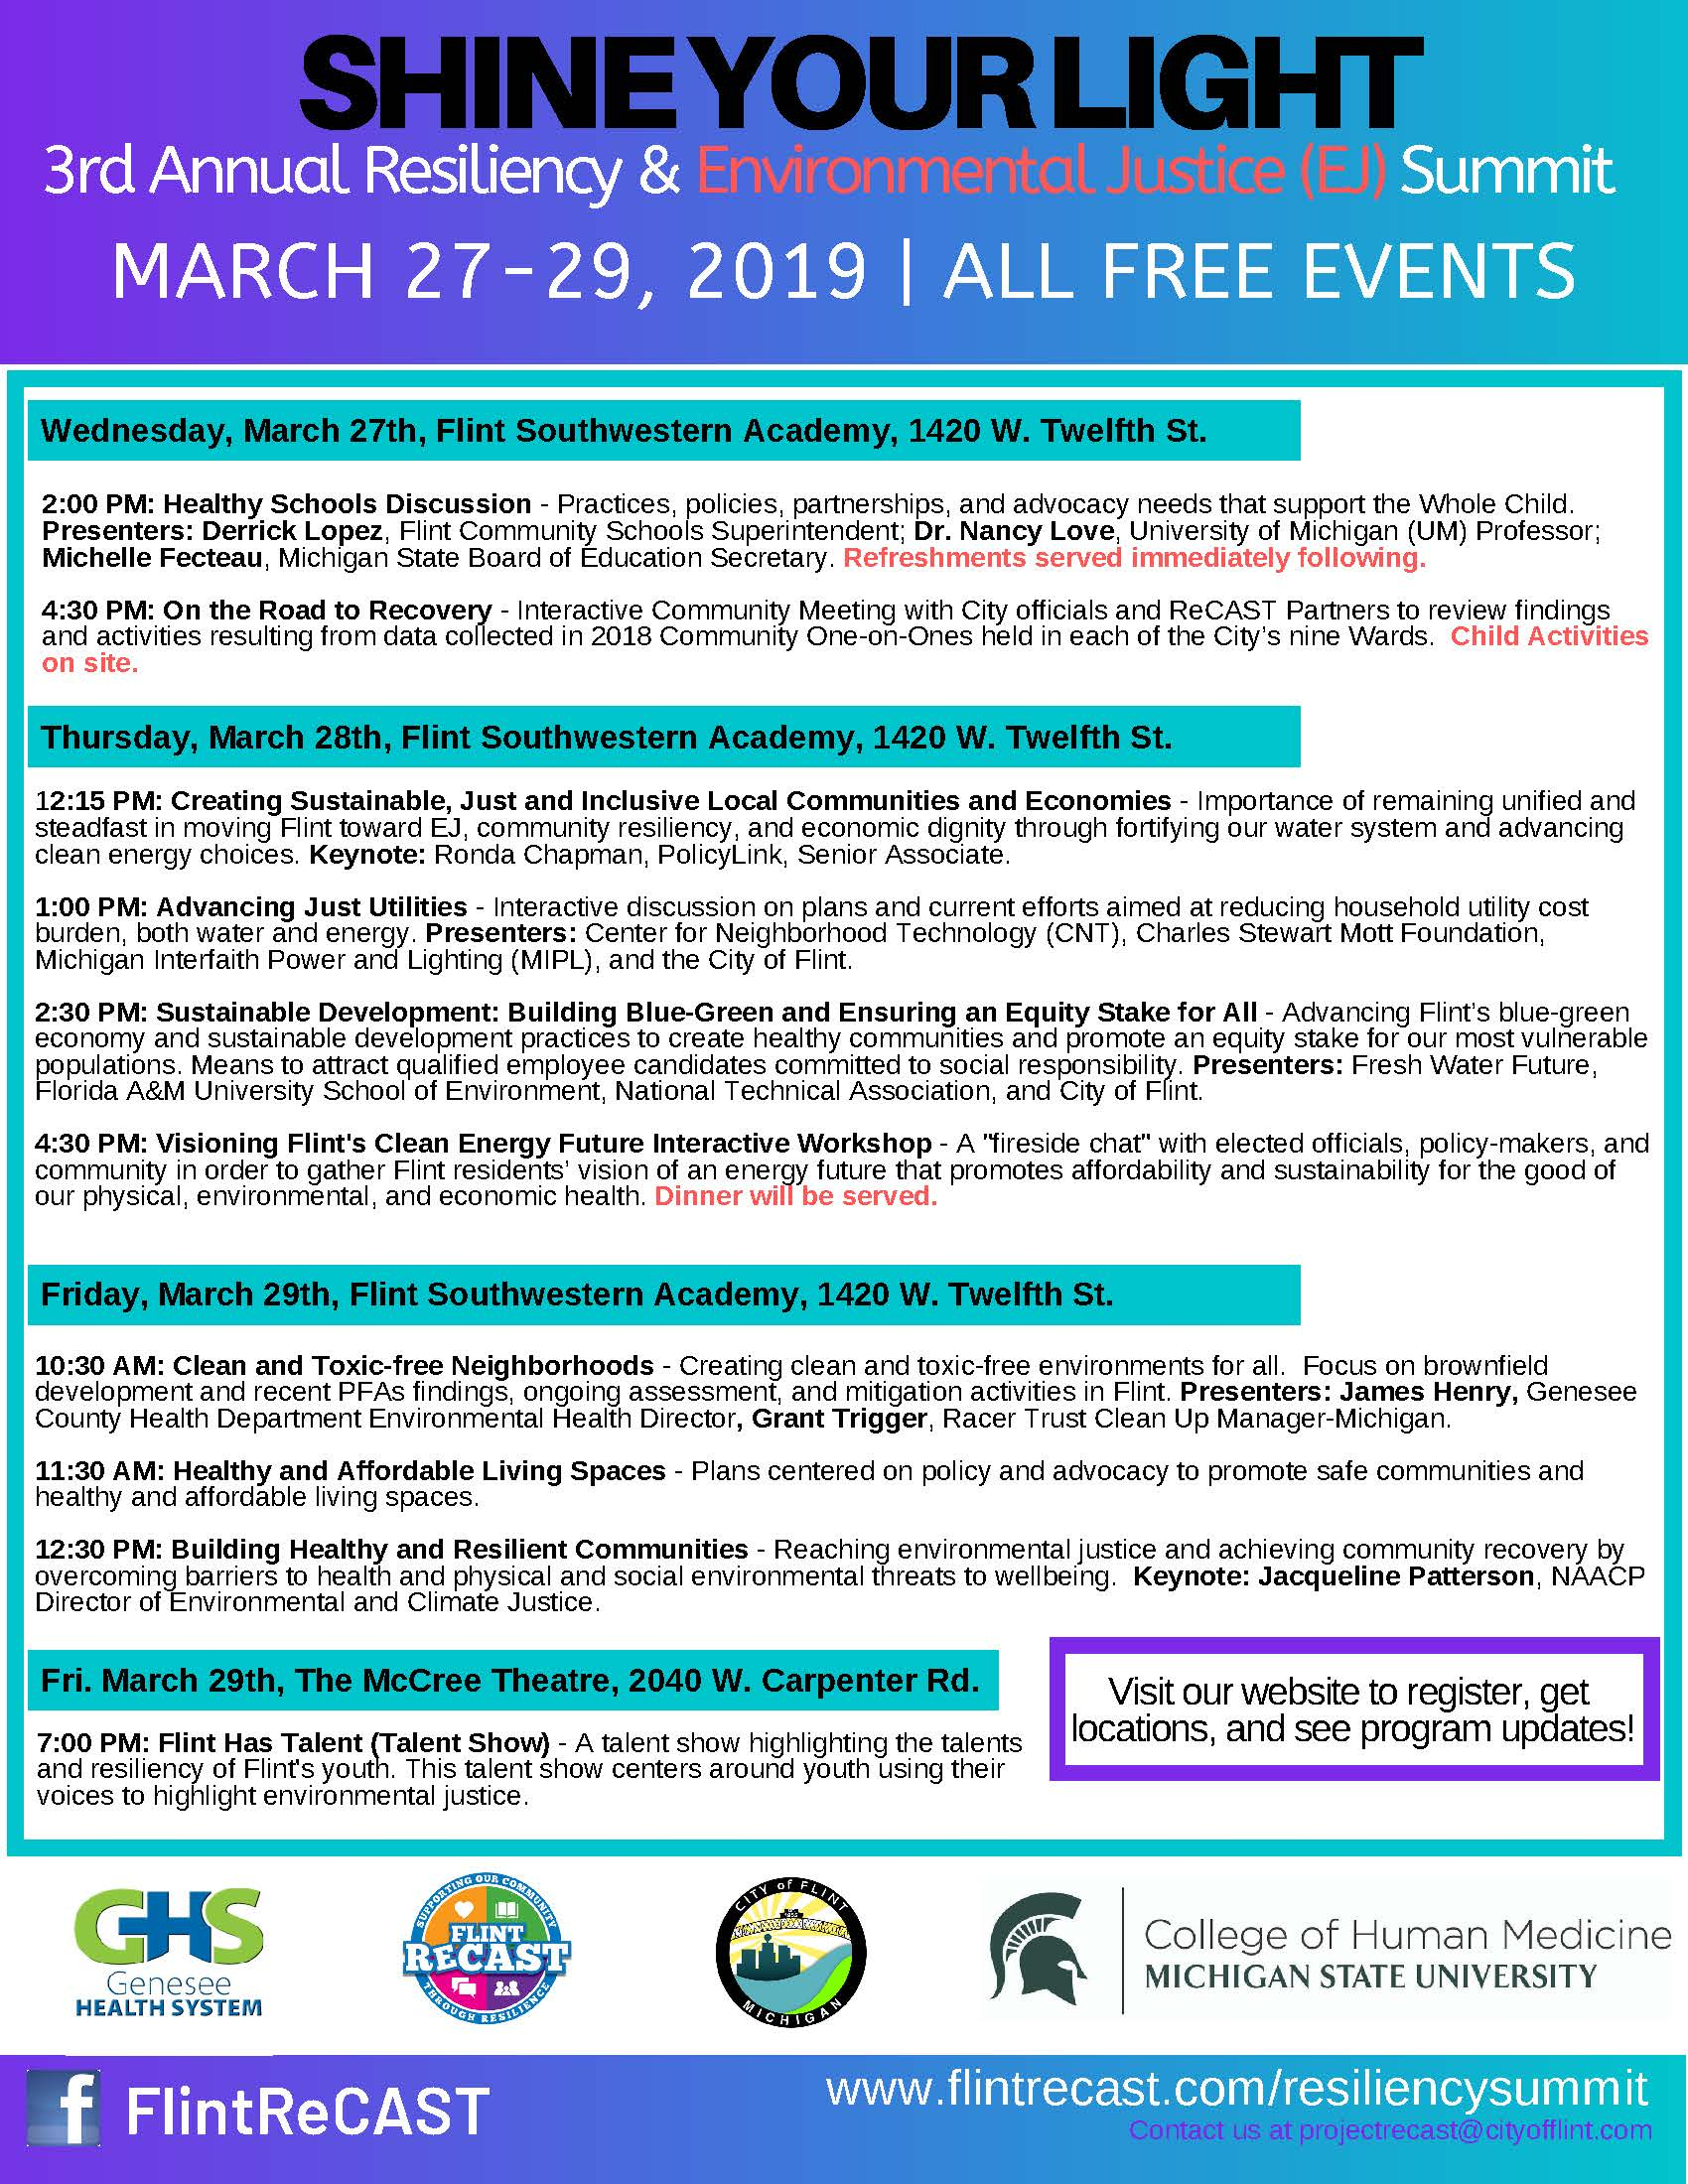 3rd Annual Flint Resiliency & Environmental Justice Summit